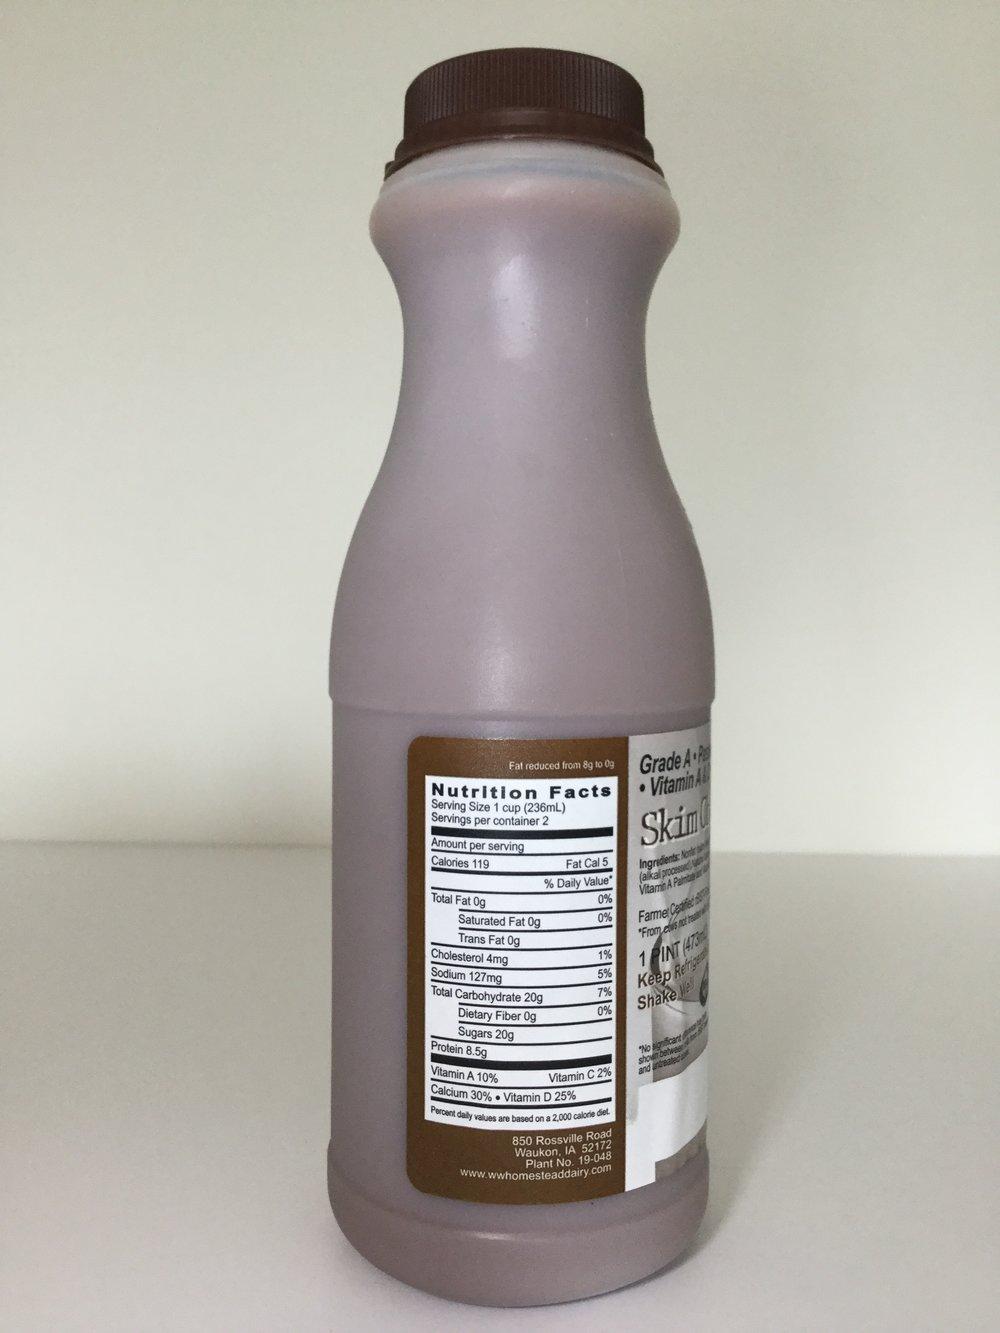 WW Homestead Dairy Chocolate Milk Side 1